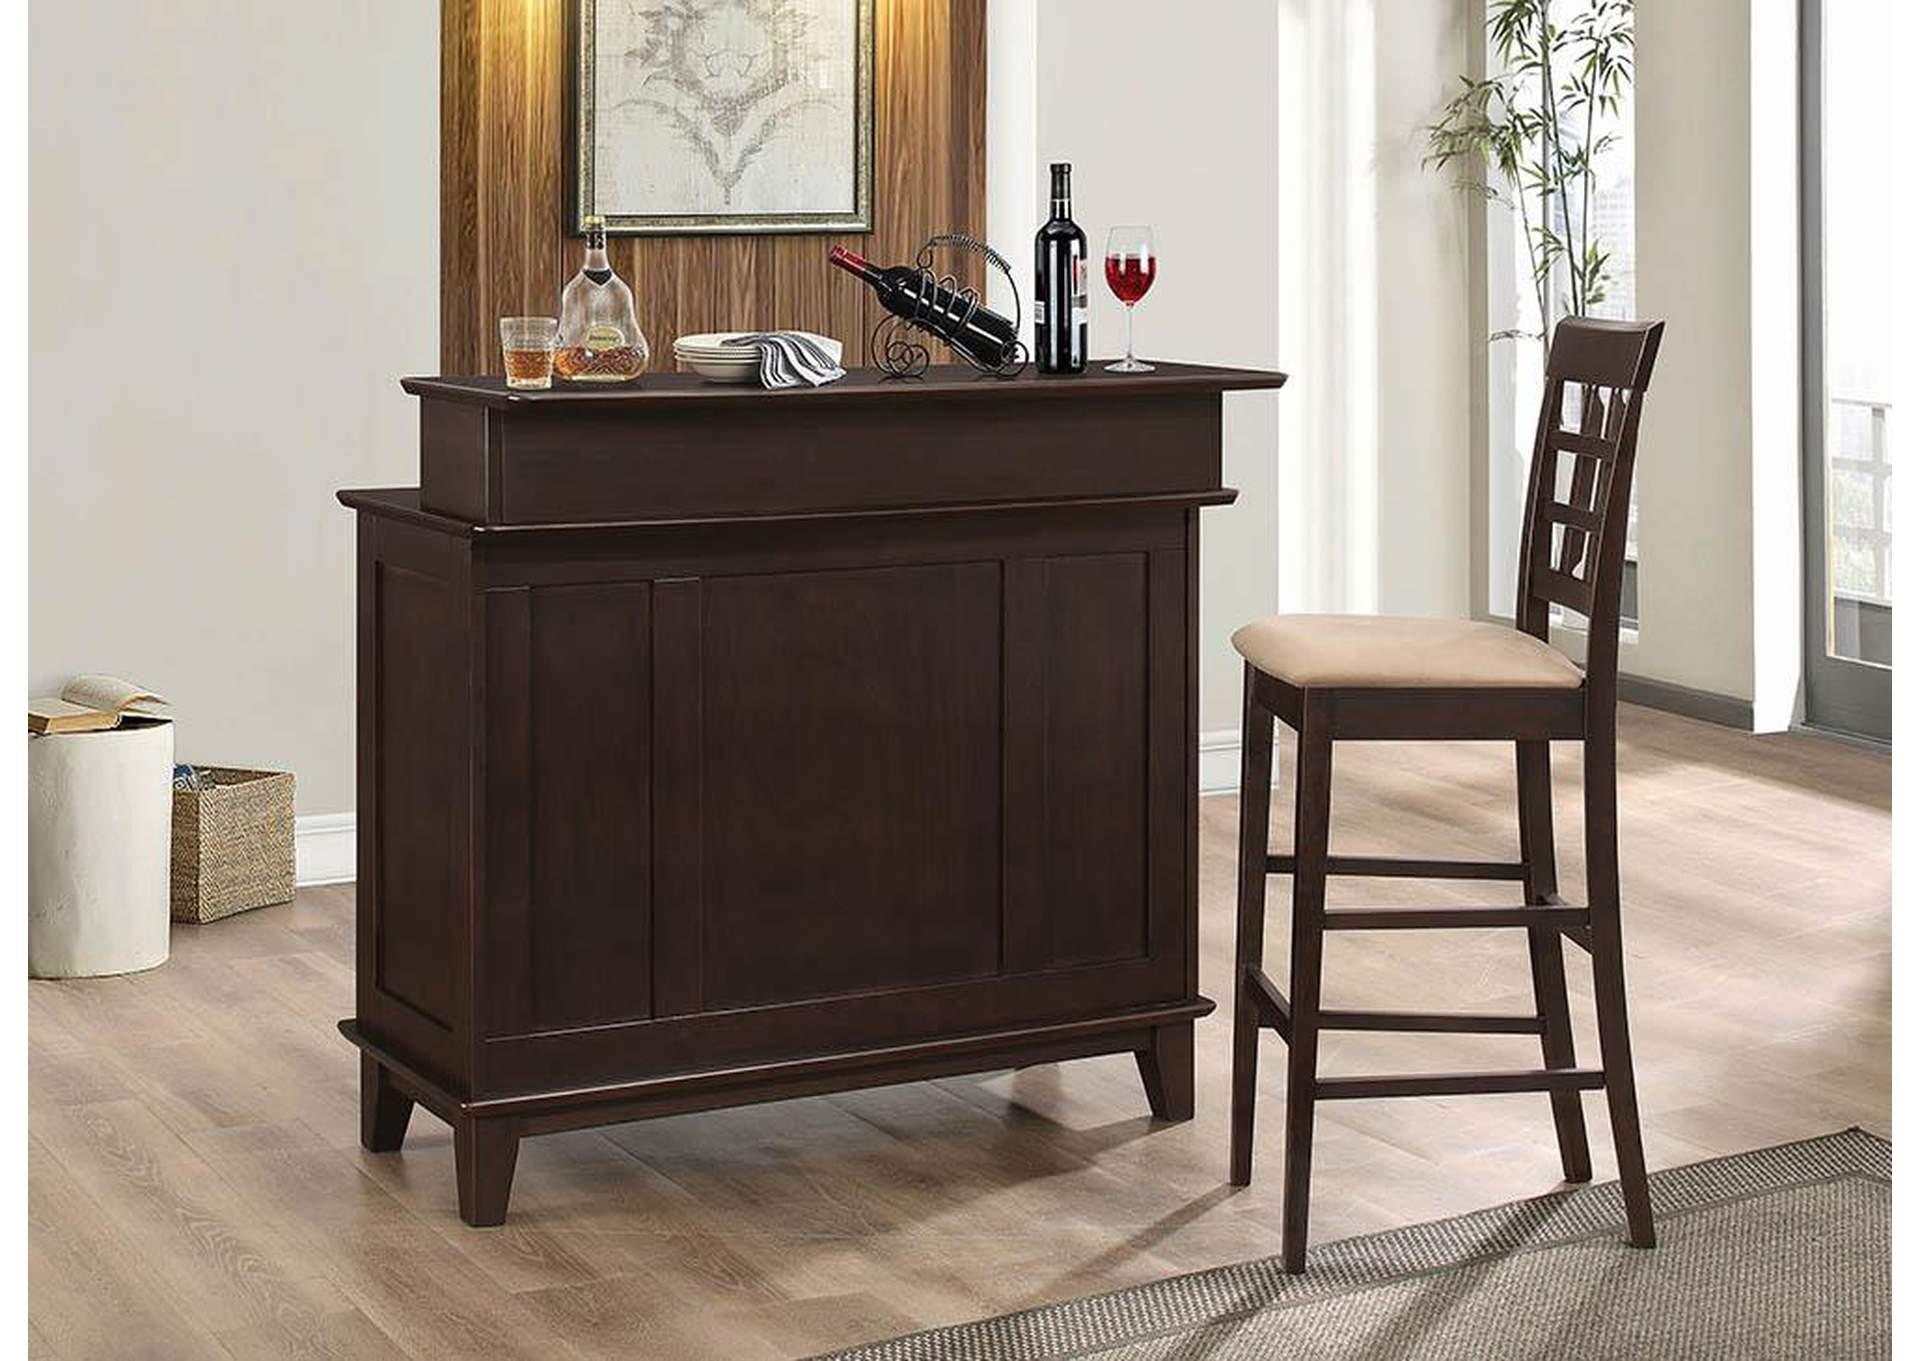 Martinez Furniture Appliance Mcallen Tx Cappuccino Bar Unit